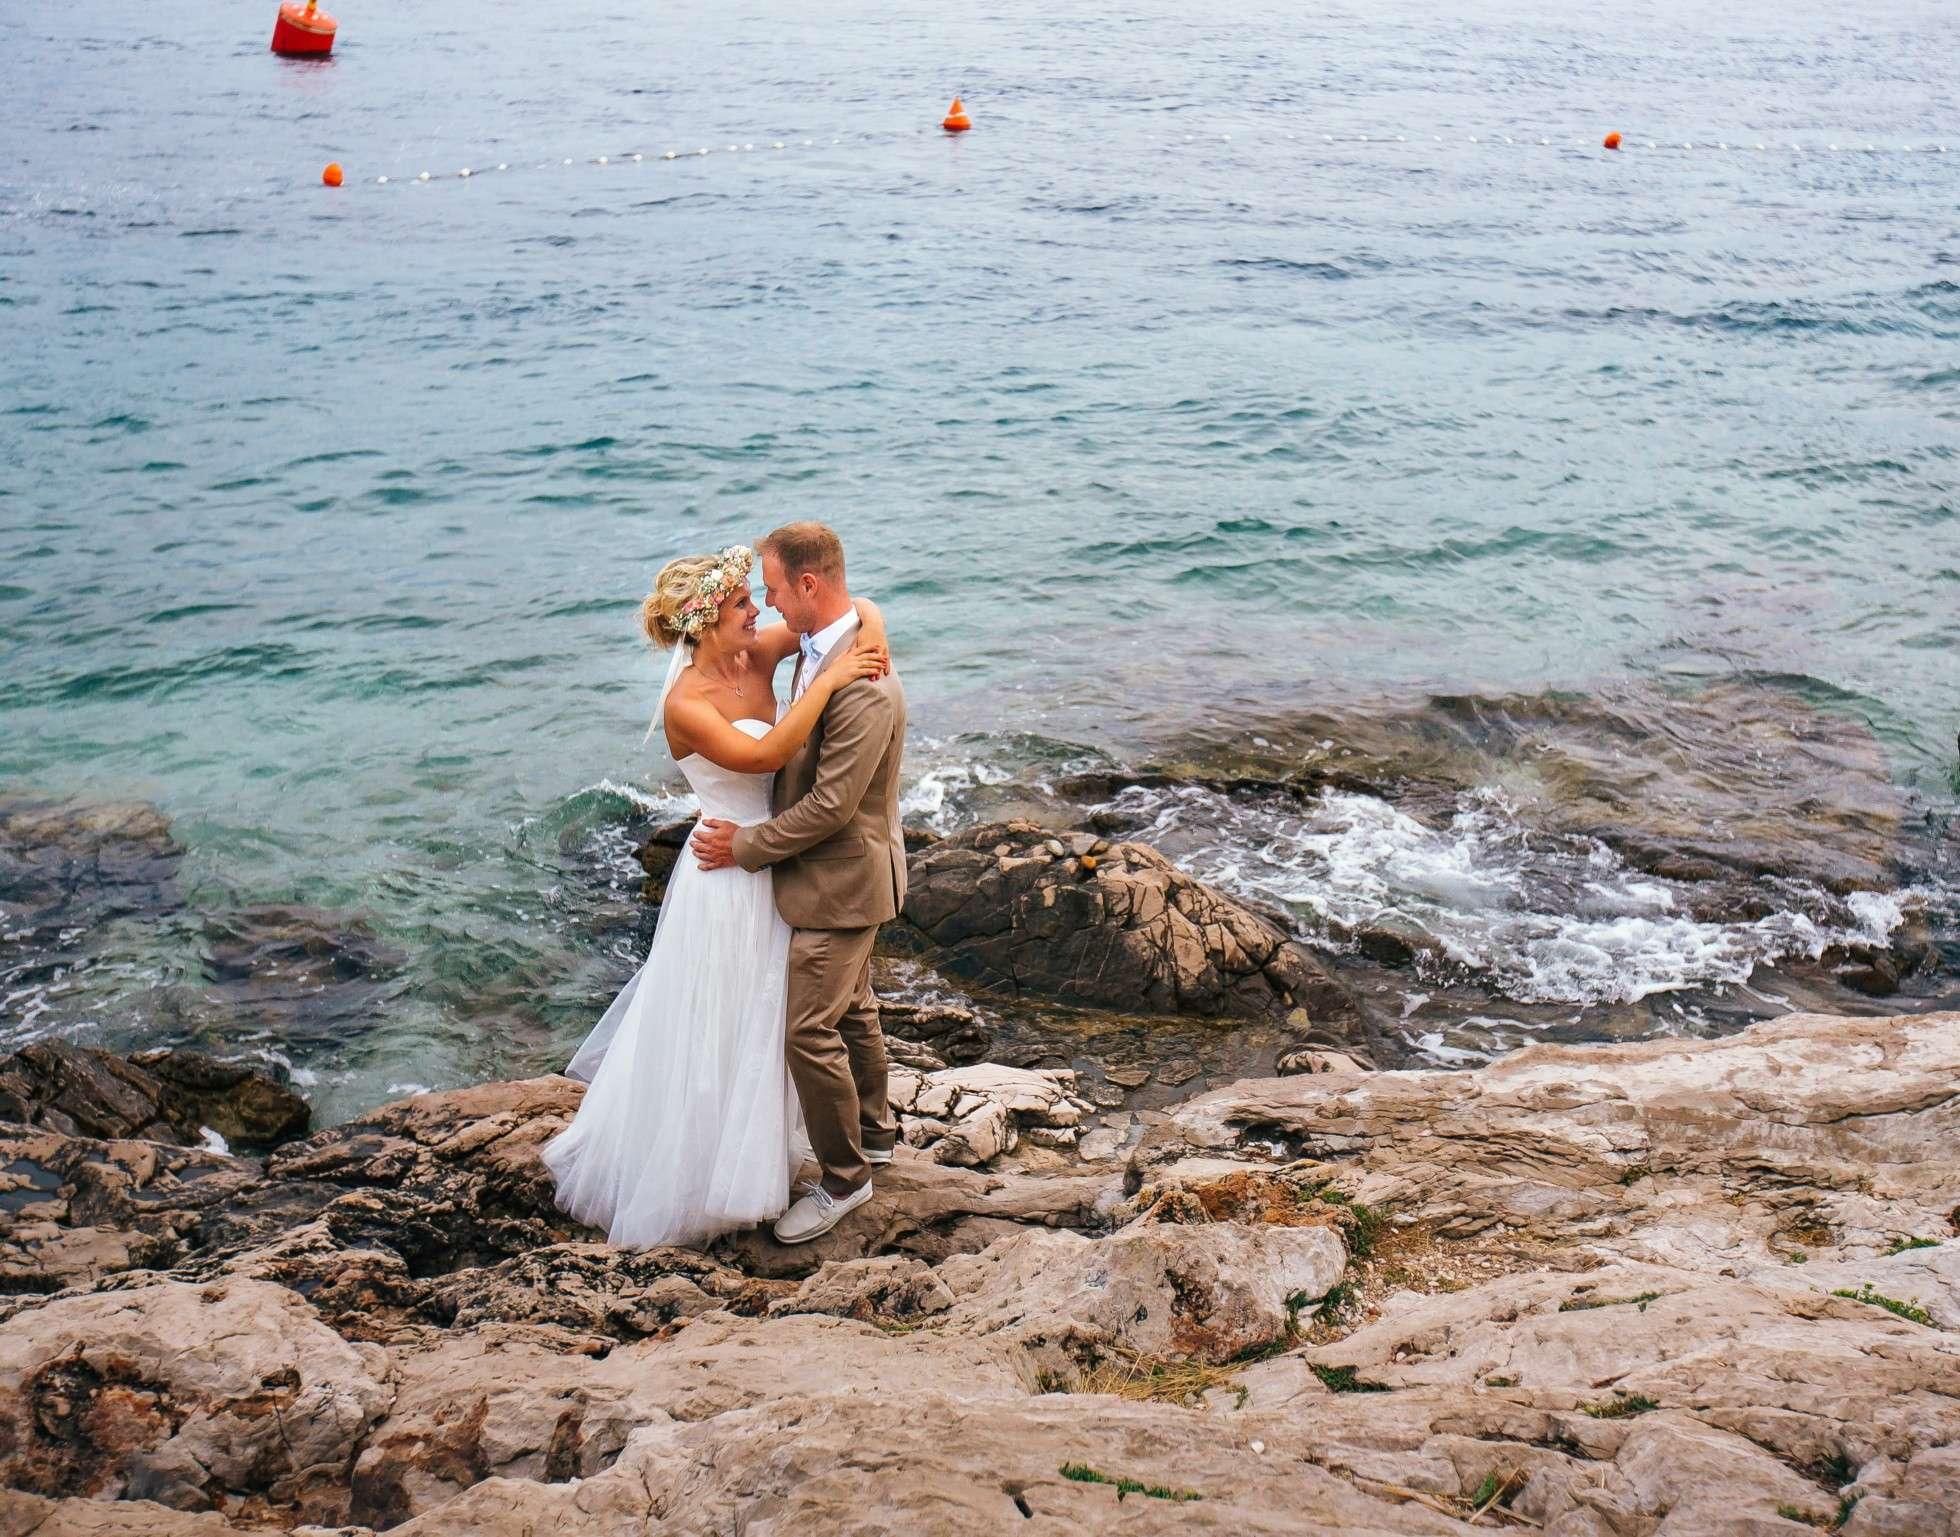 hvar; marrytale; heiraten in hvar; heiraten in kroatien; wedding planner hvar; wedding planner croatia; hochzeitsplaner hvar; hochzeitsplaner kroatien; brautpaar; bridal couple